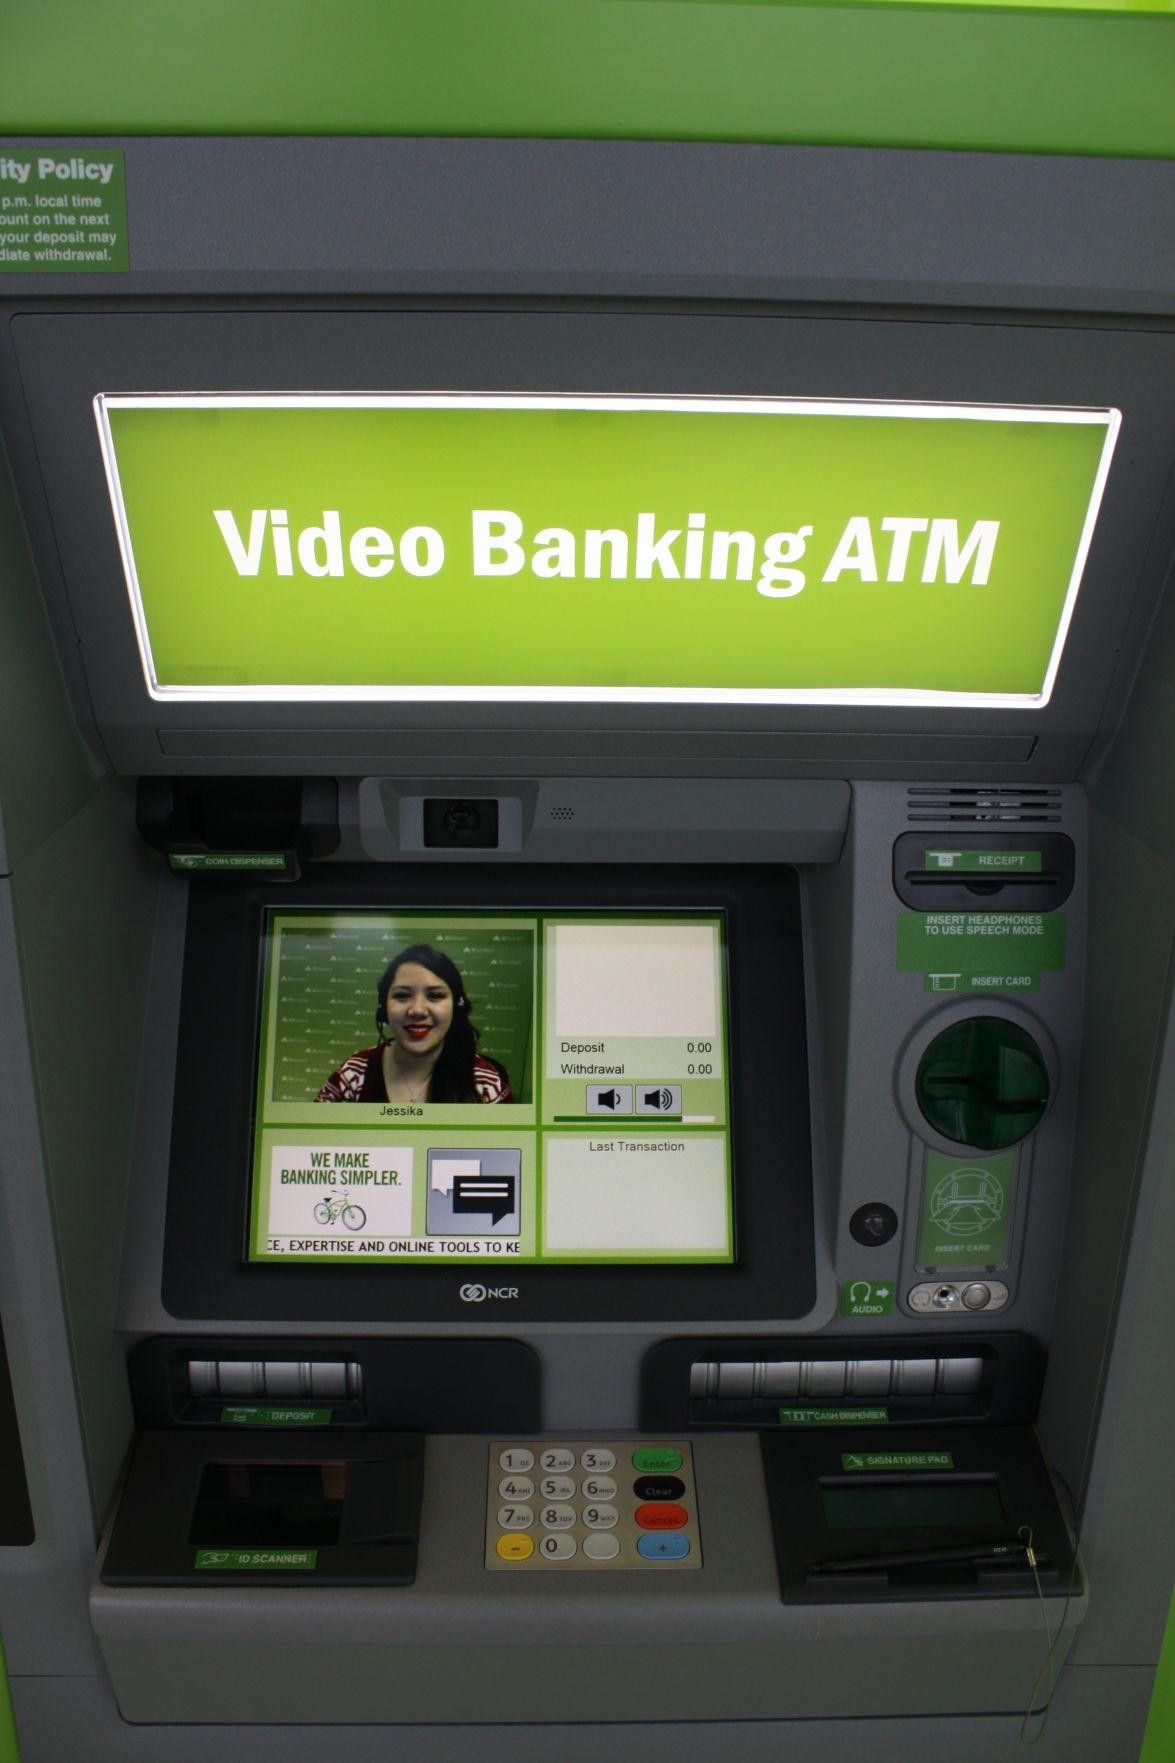 Regions Video Banking ATM 01